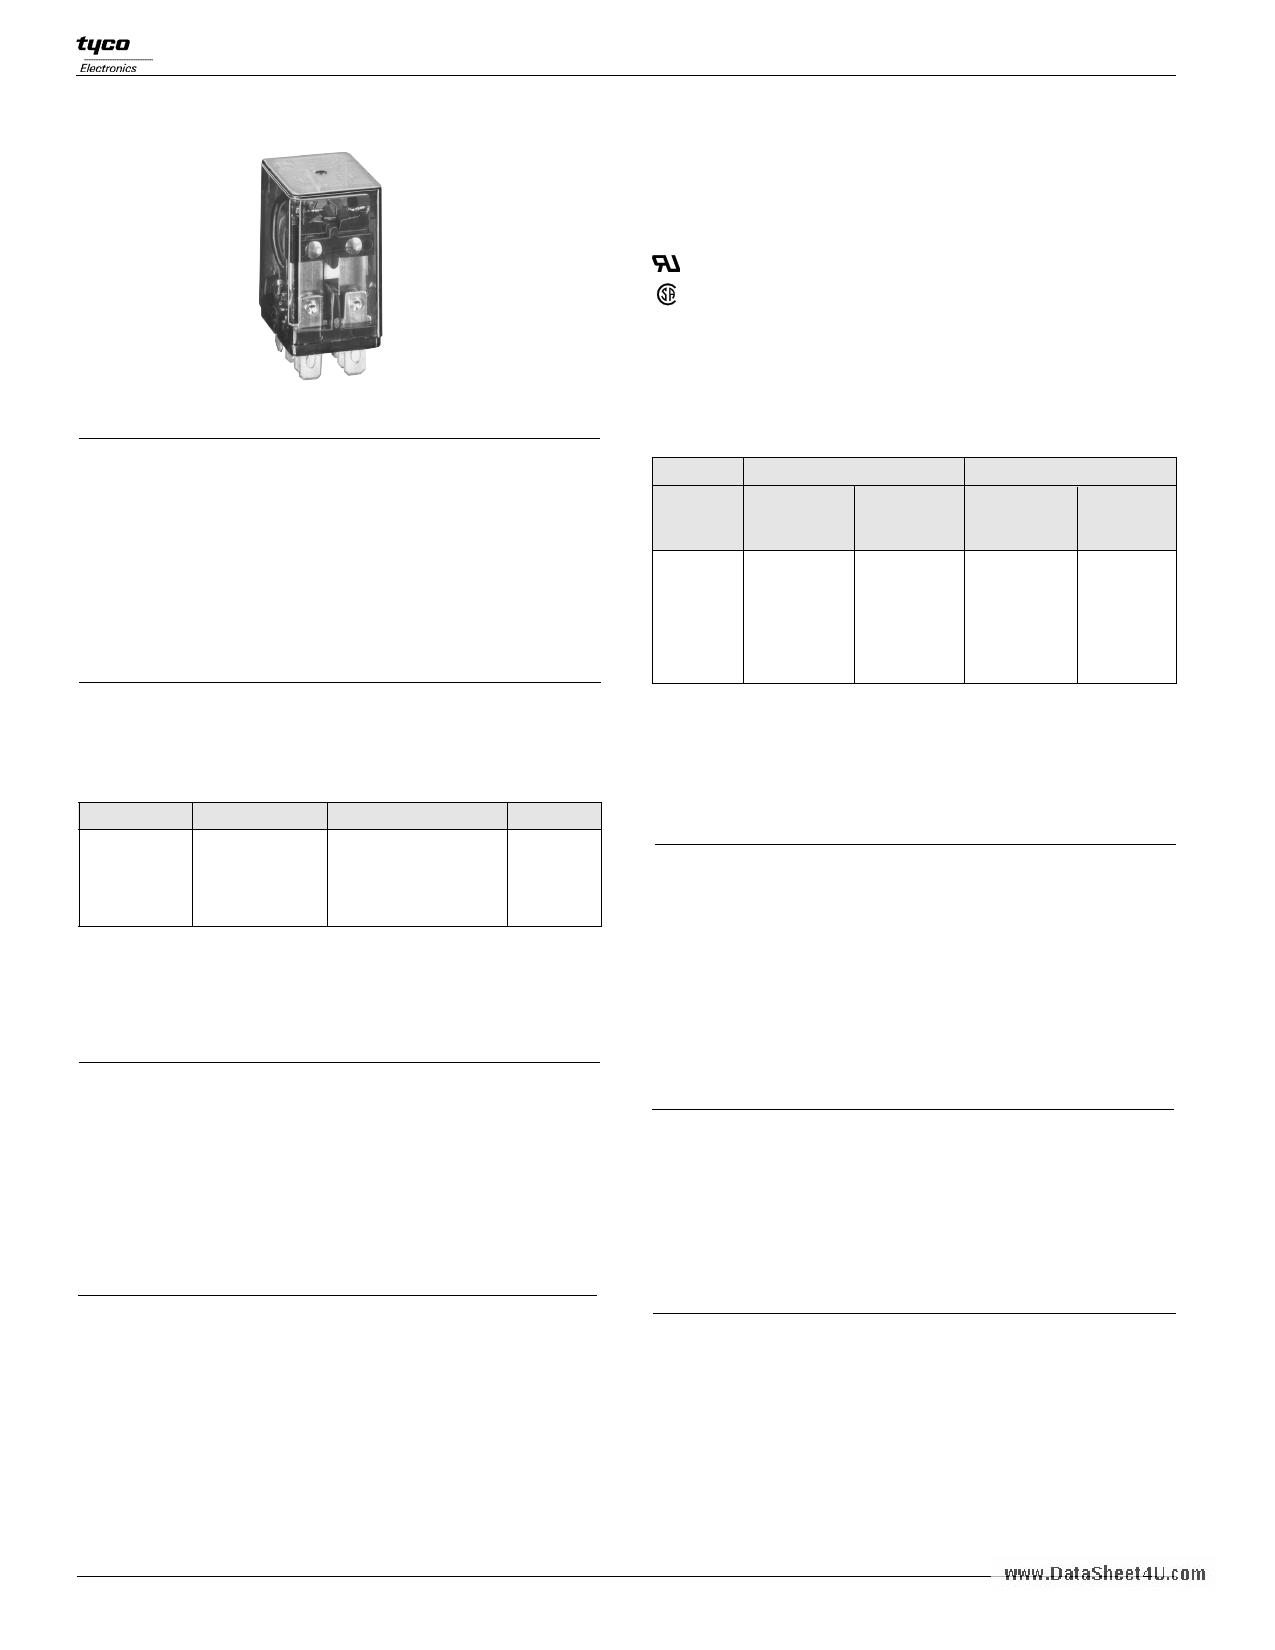 K10 datasheet